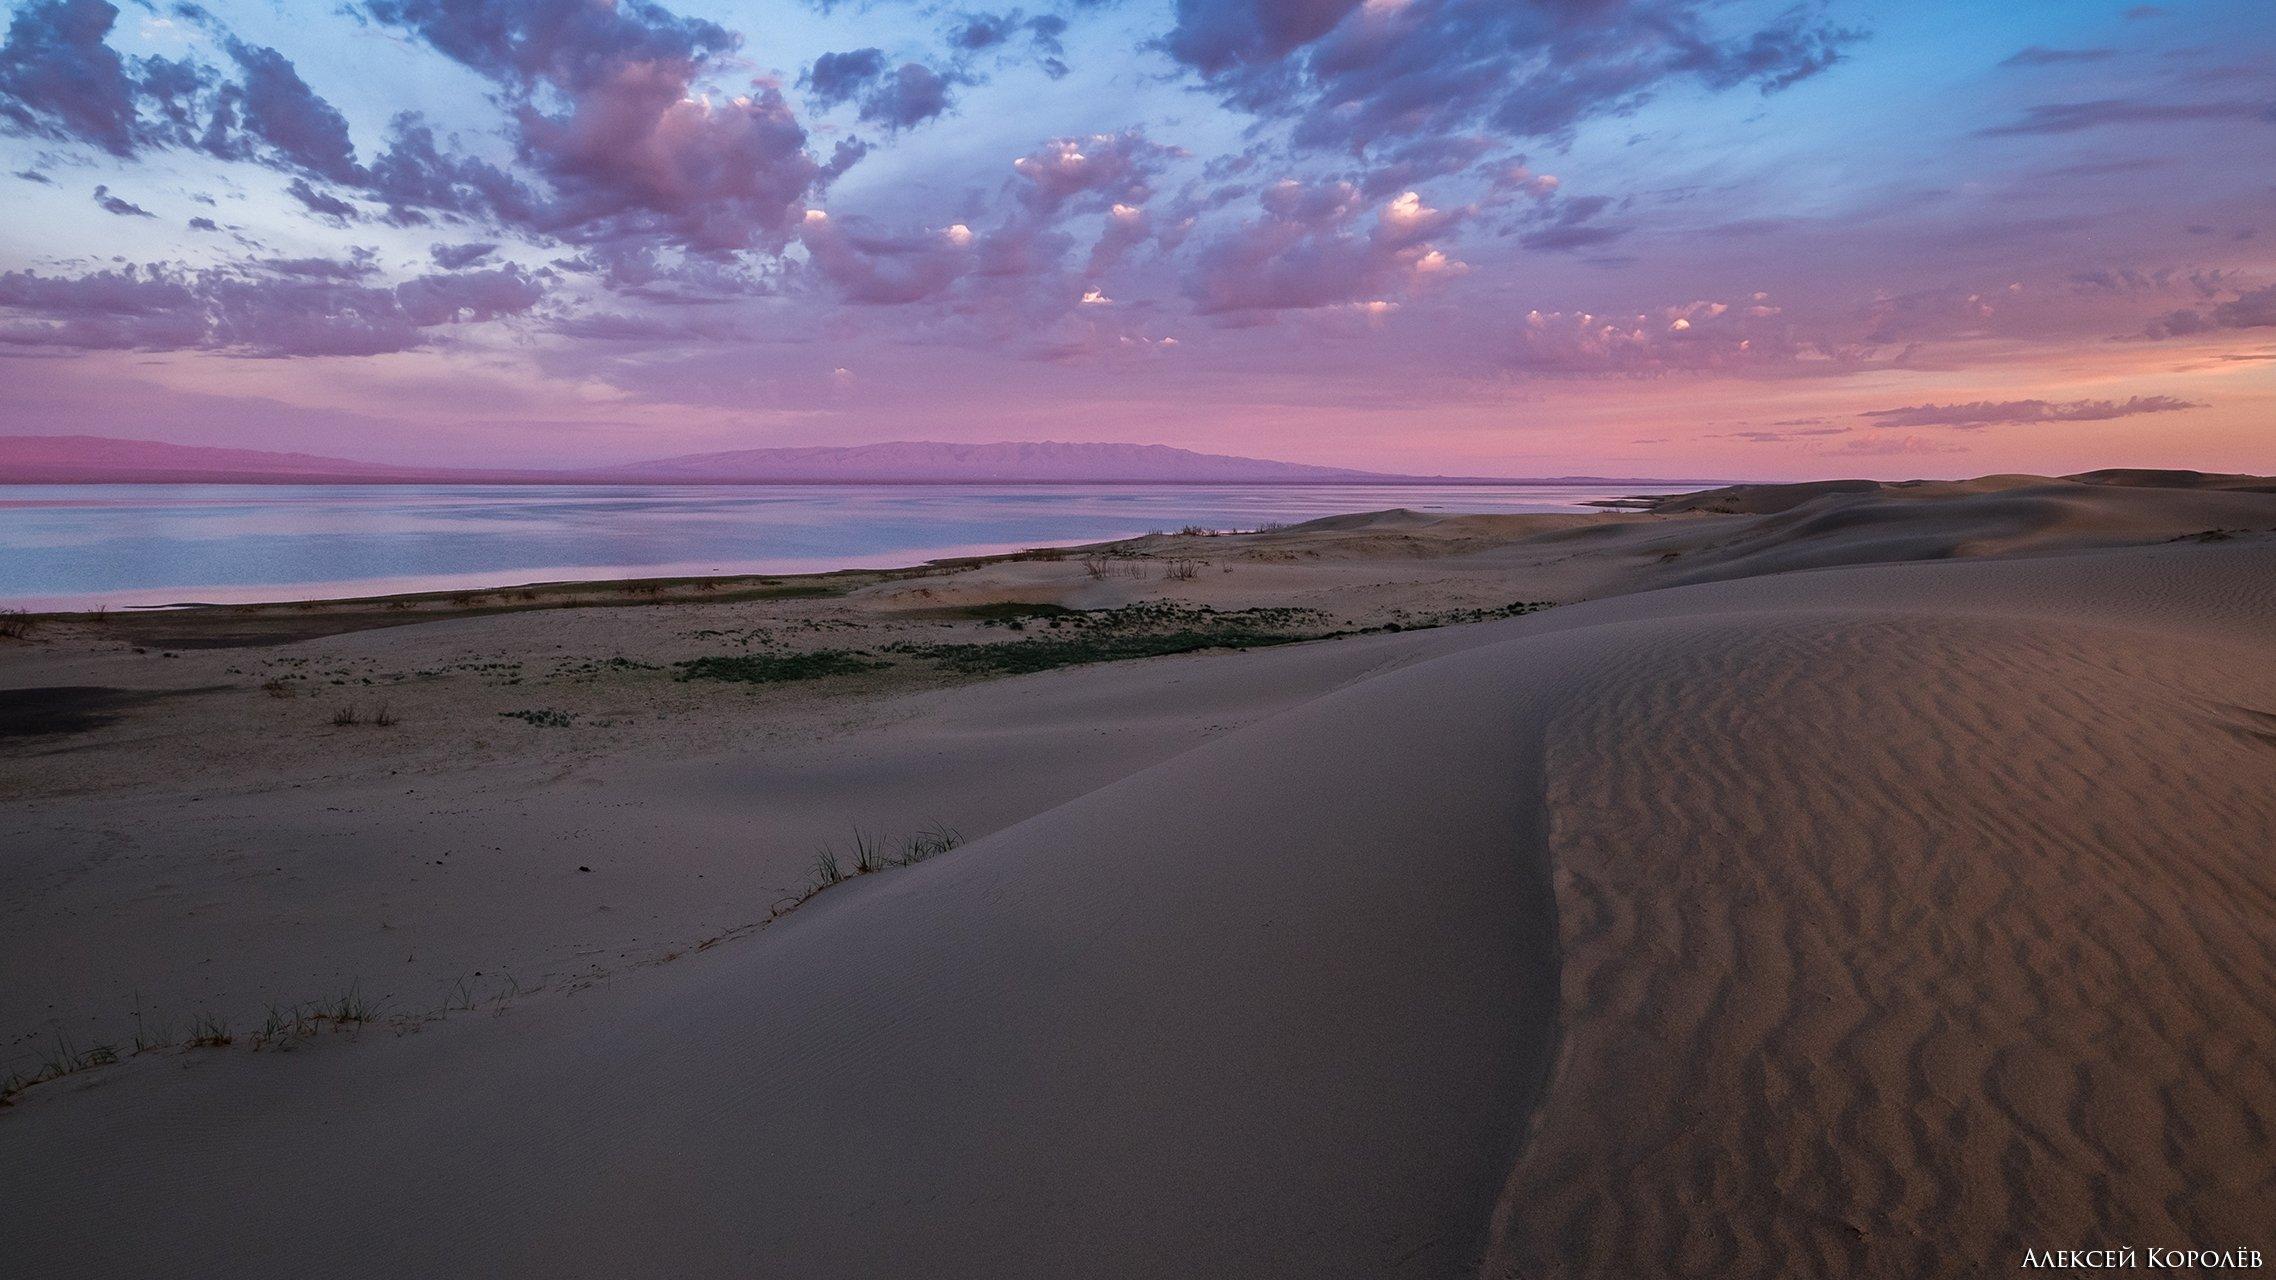 монголия, восход, озеро, пустыня, песок, пейзаж, природа, лето, mongolia, sunrise, lake, desert, sand, landscape, nature, summer, Алексей Королёв